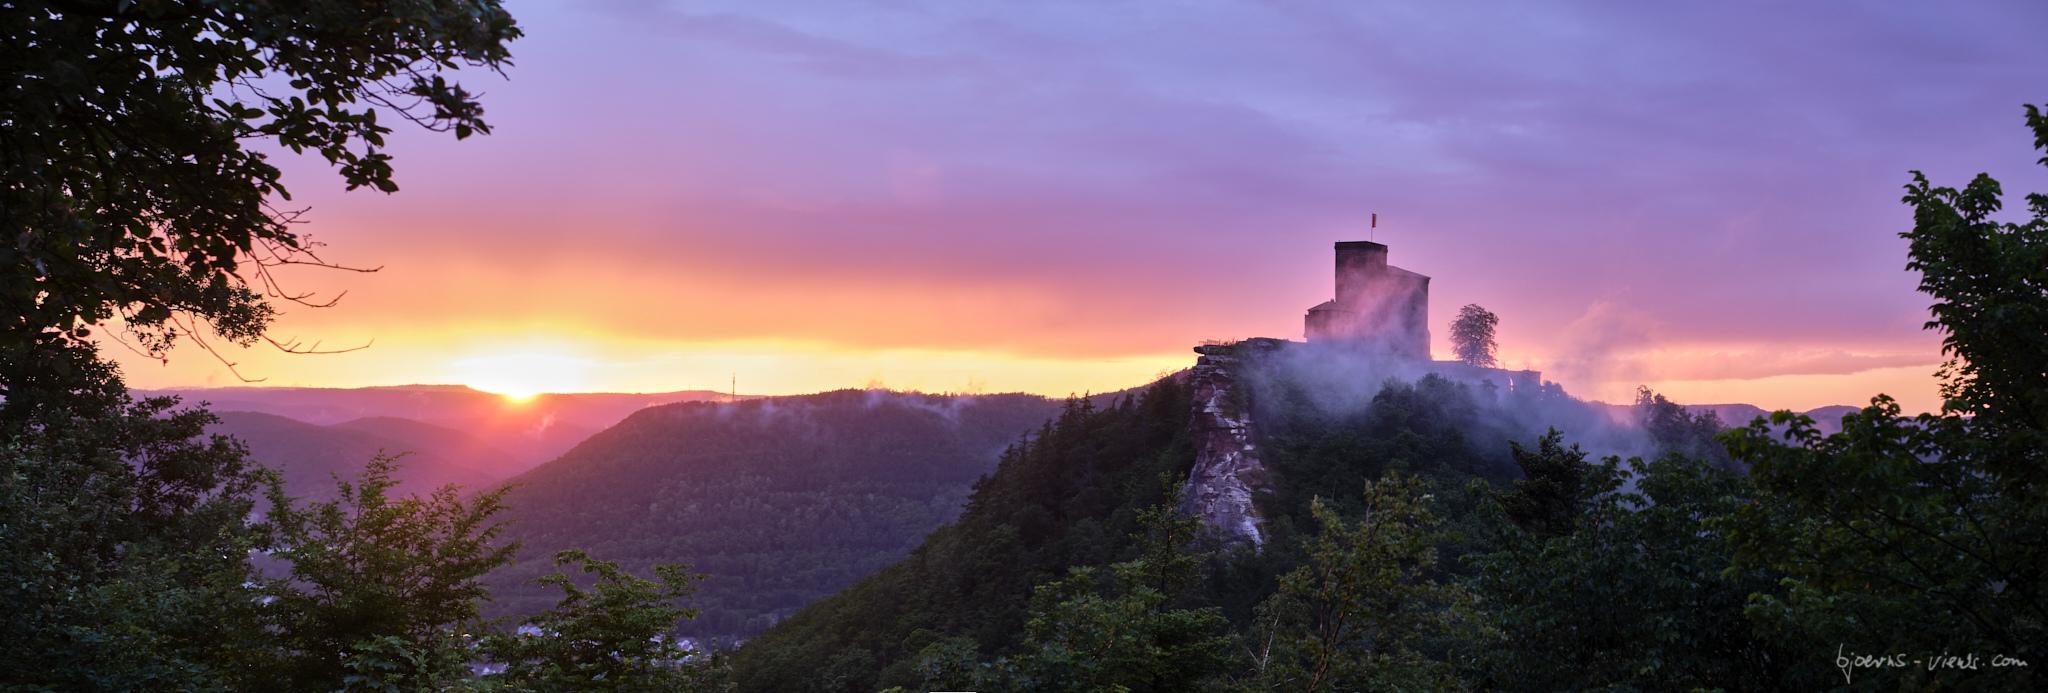 Sonnenaufgang, Pfalz, Lindelbrunn, Trifels, Annweiler, Sunrise, Nebel, Fog, Burg, Castle, Pfälzerwald